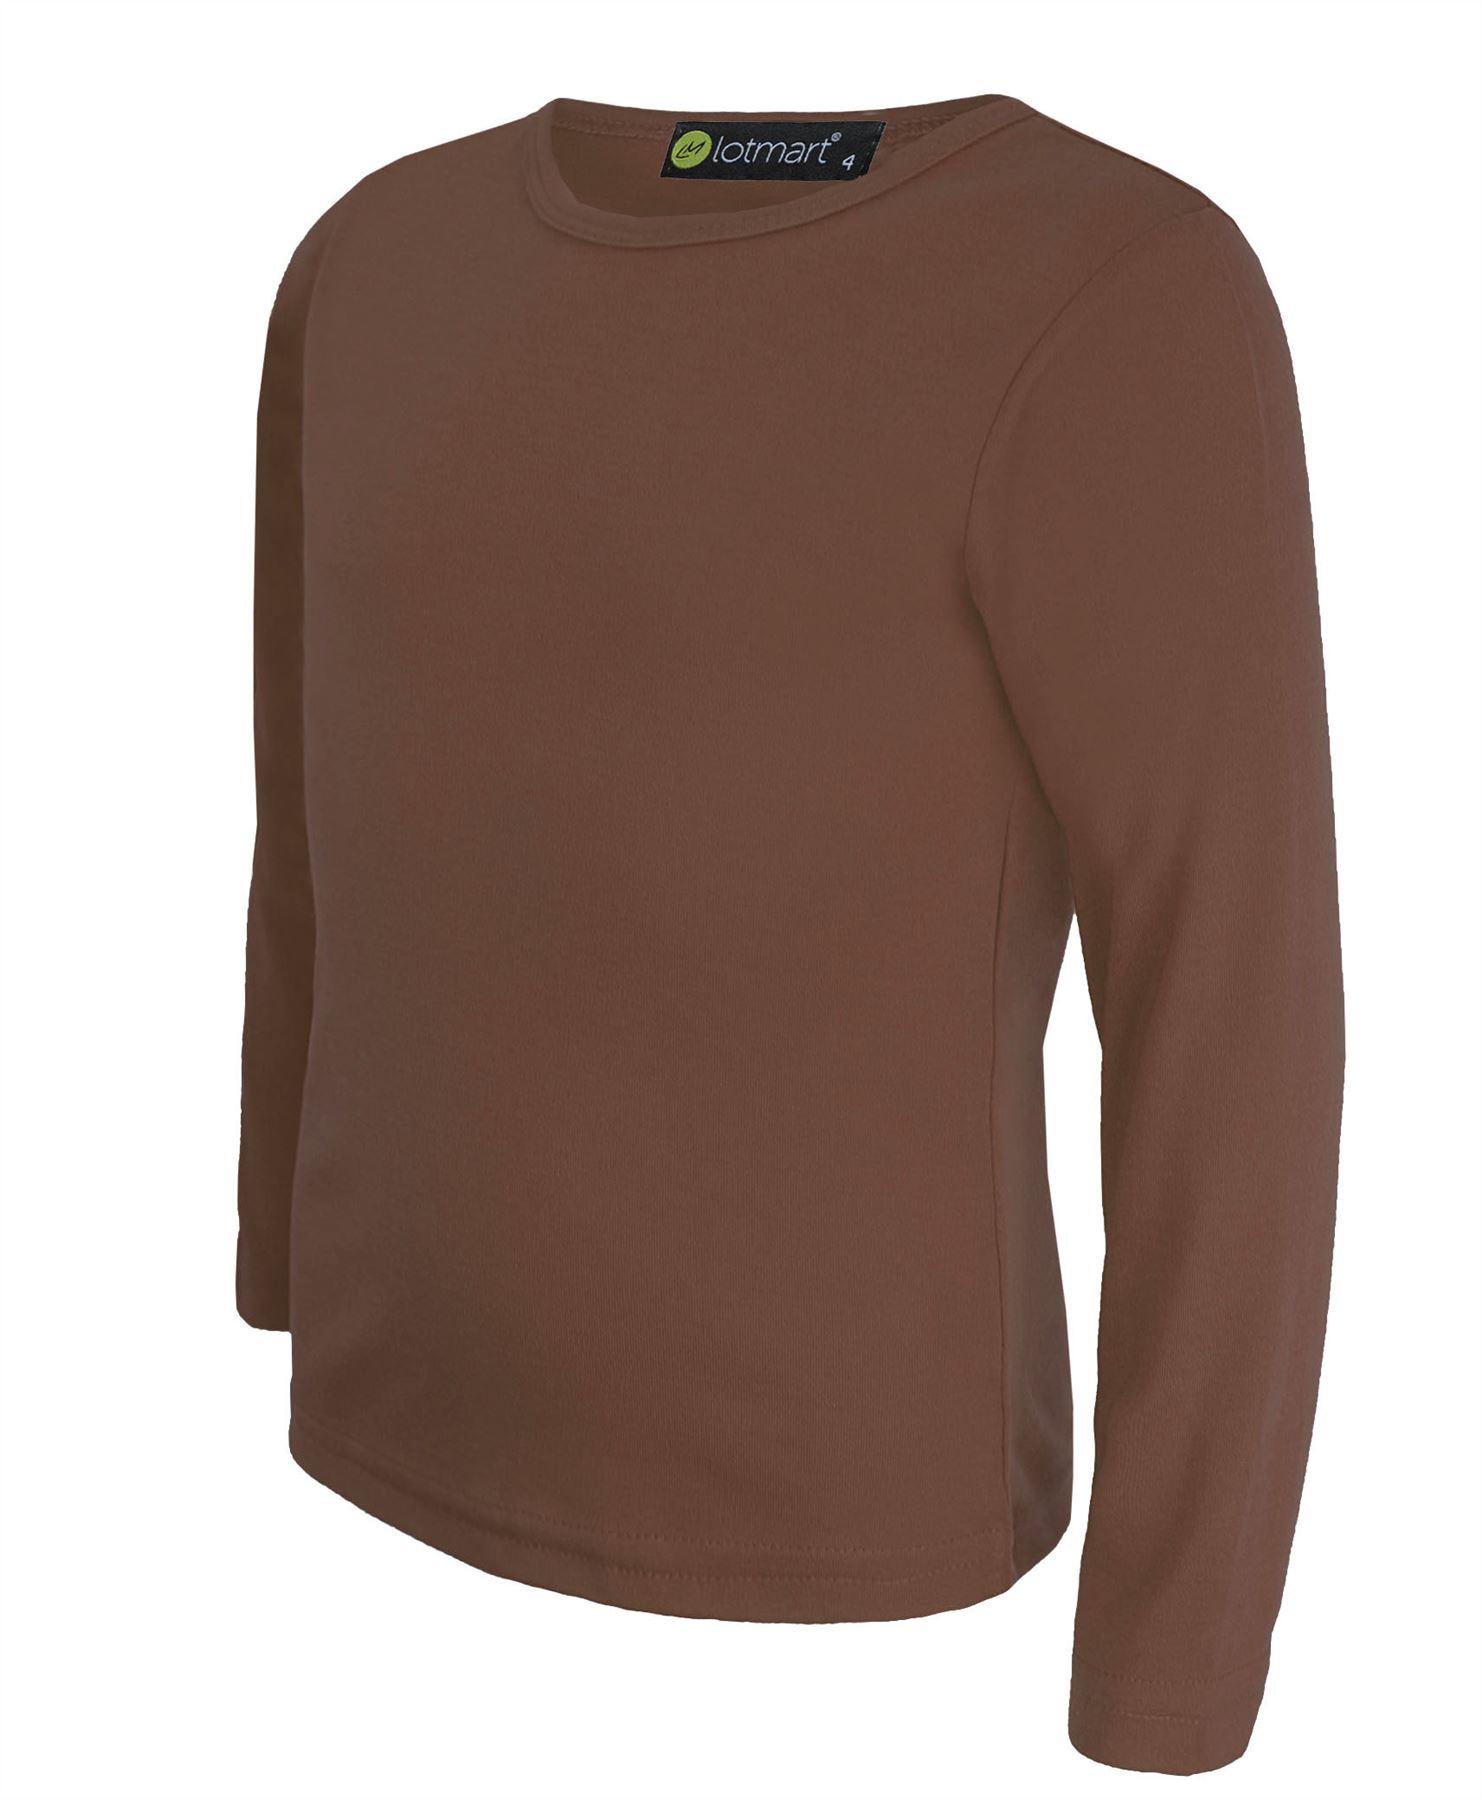 Kids plain basic top long sleeve girls boys t shirt tops for T shirts for kids